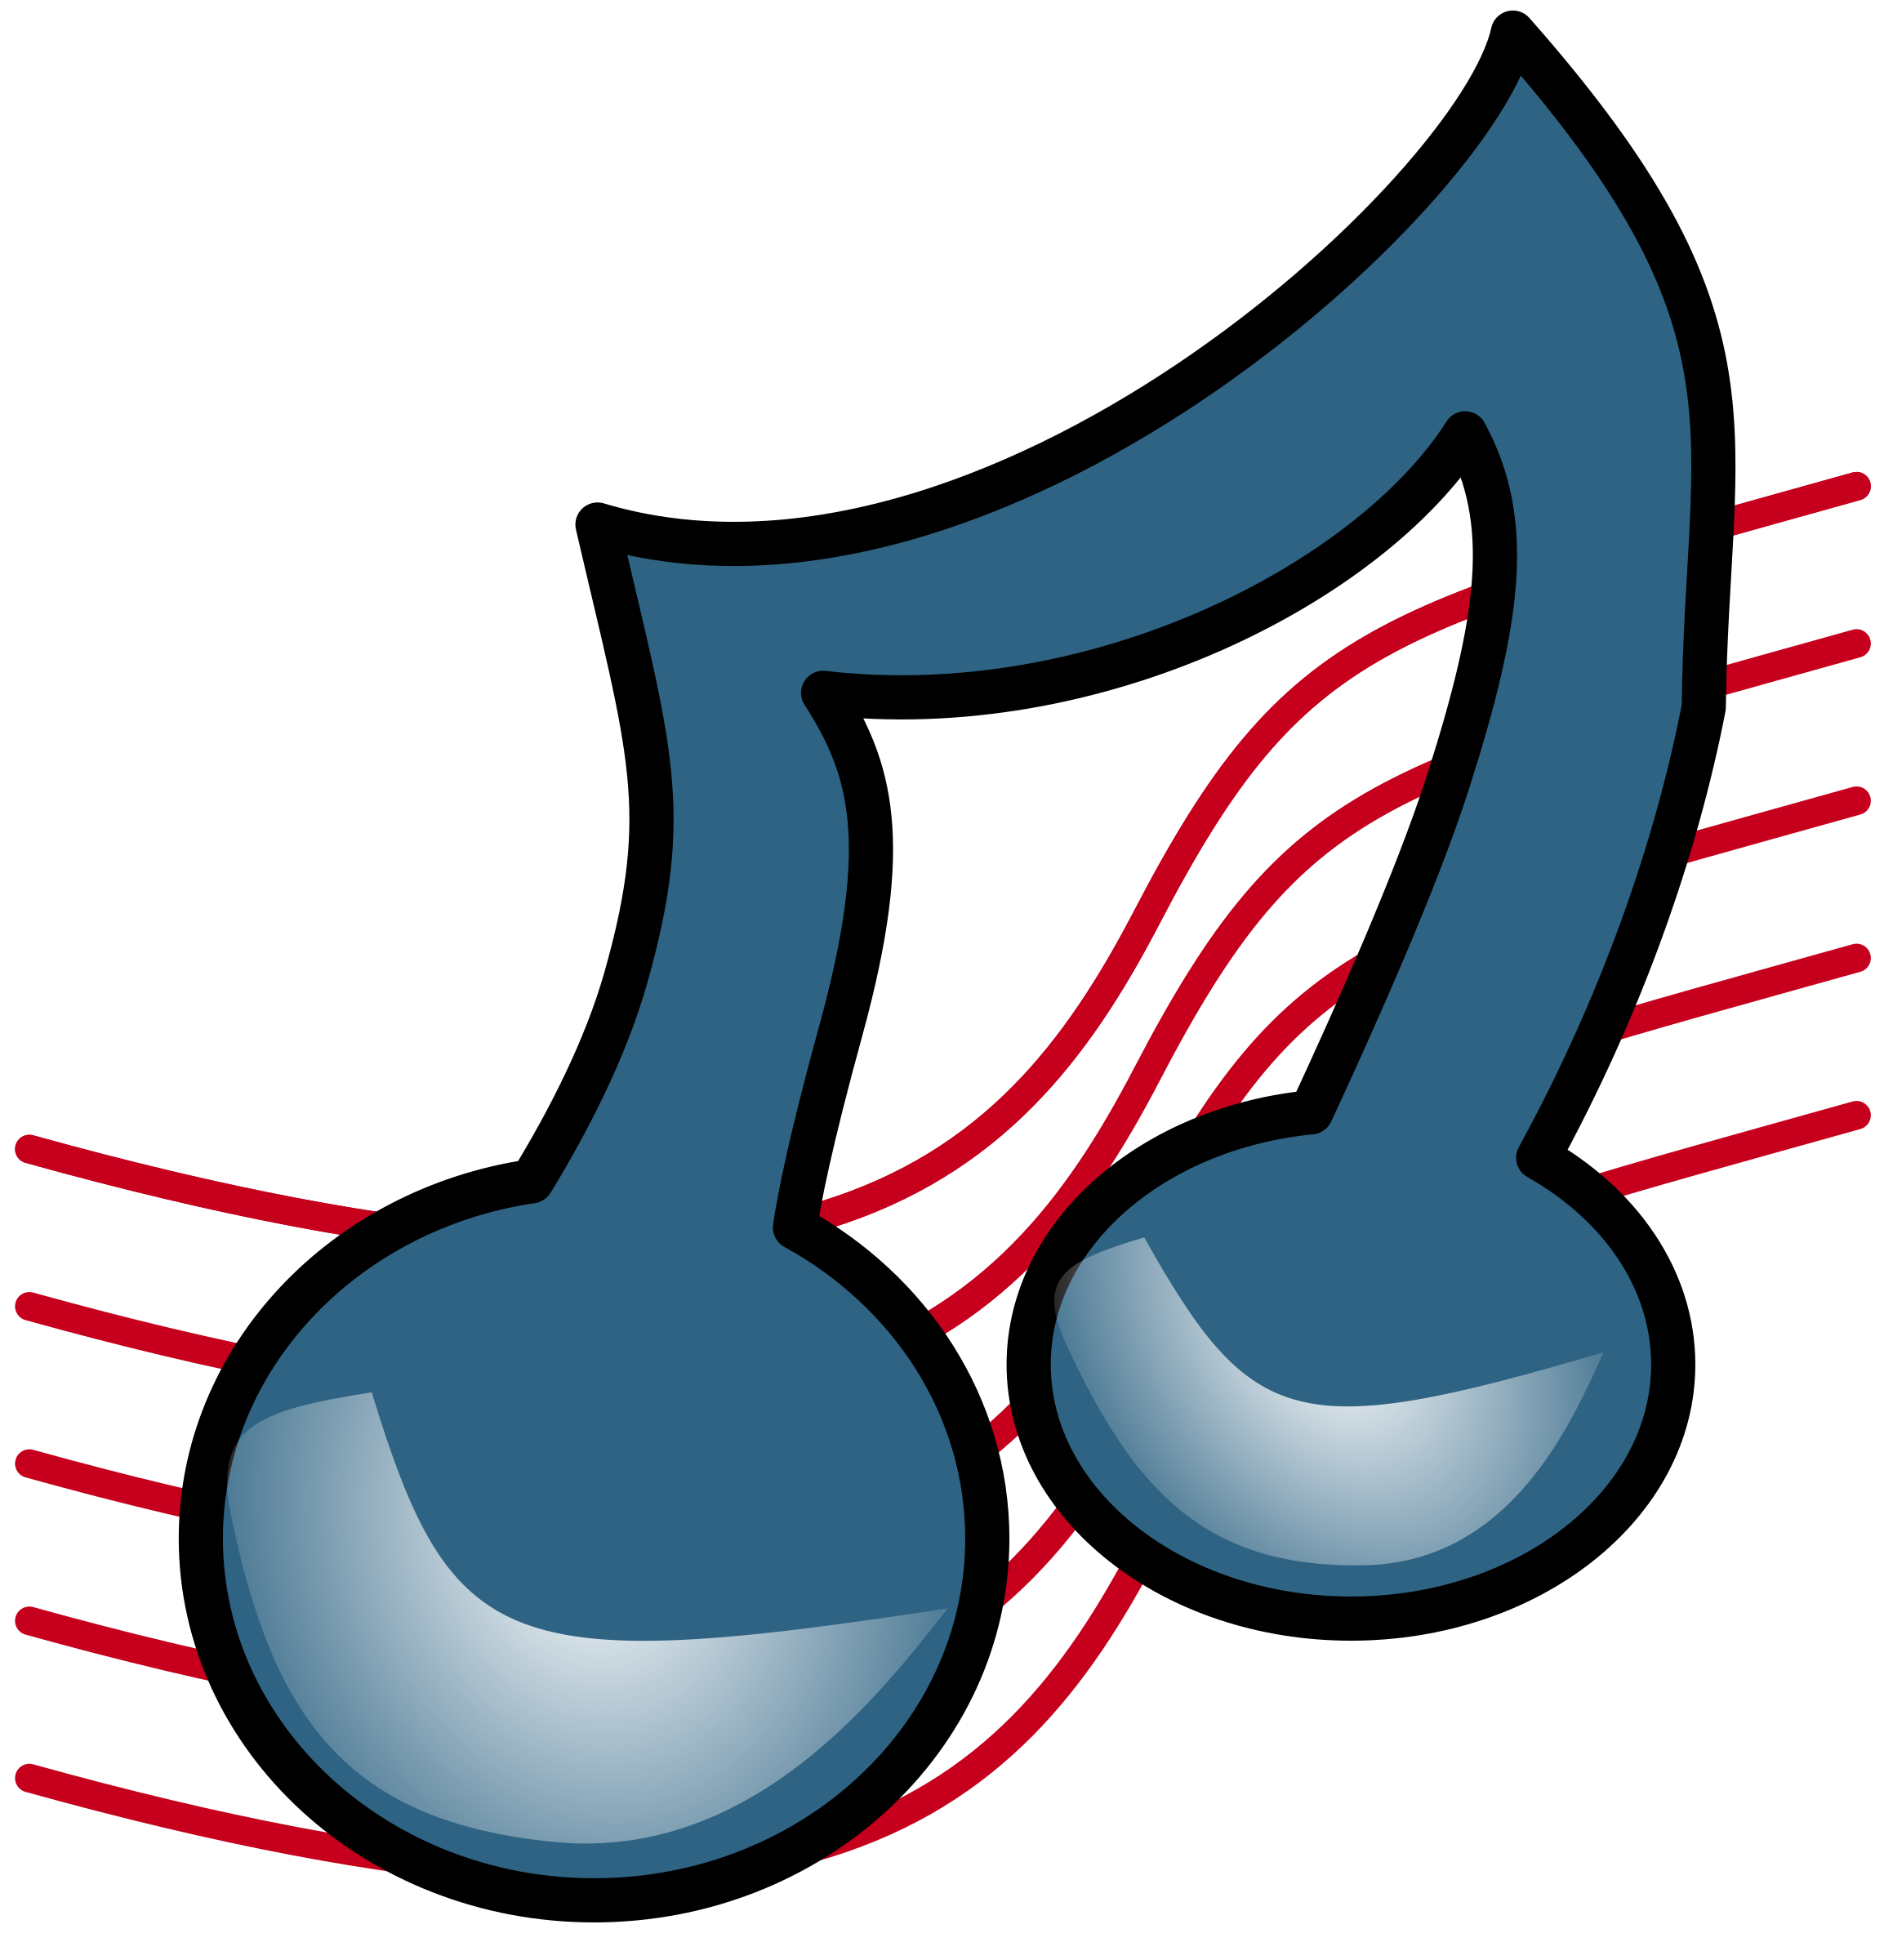 Clipart music music symbol. Musical bold big image